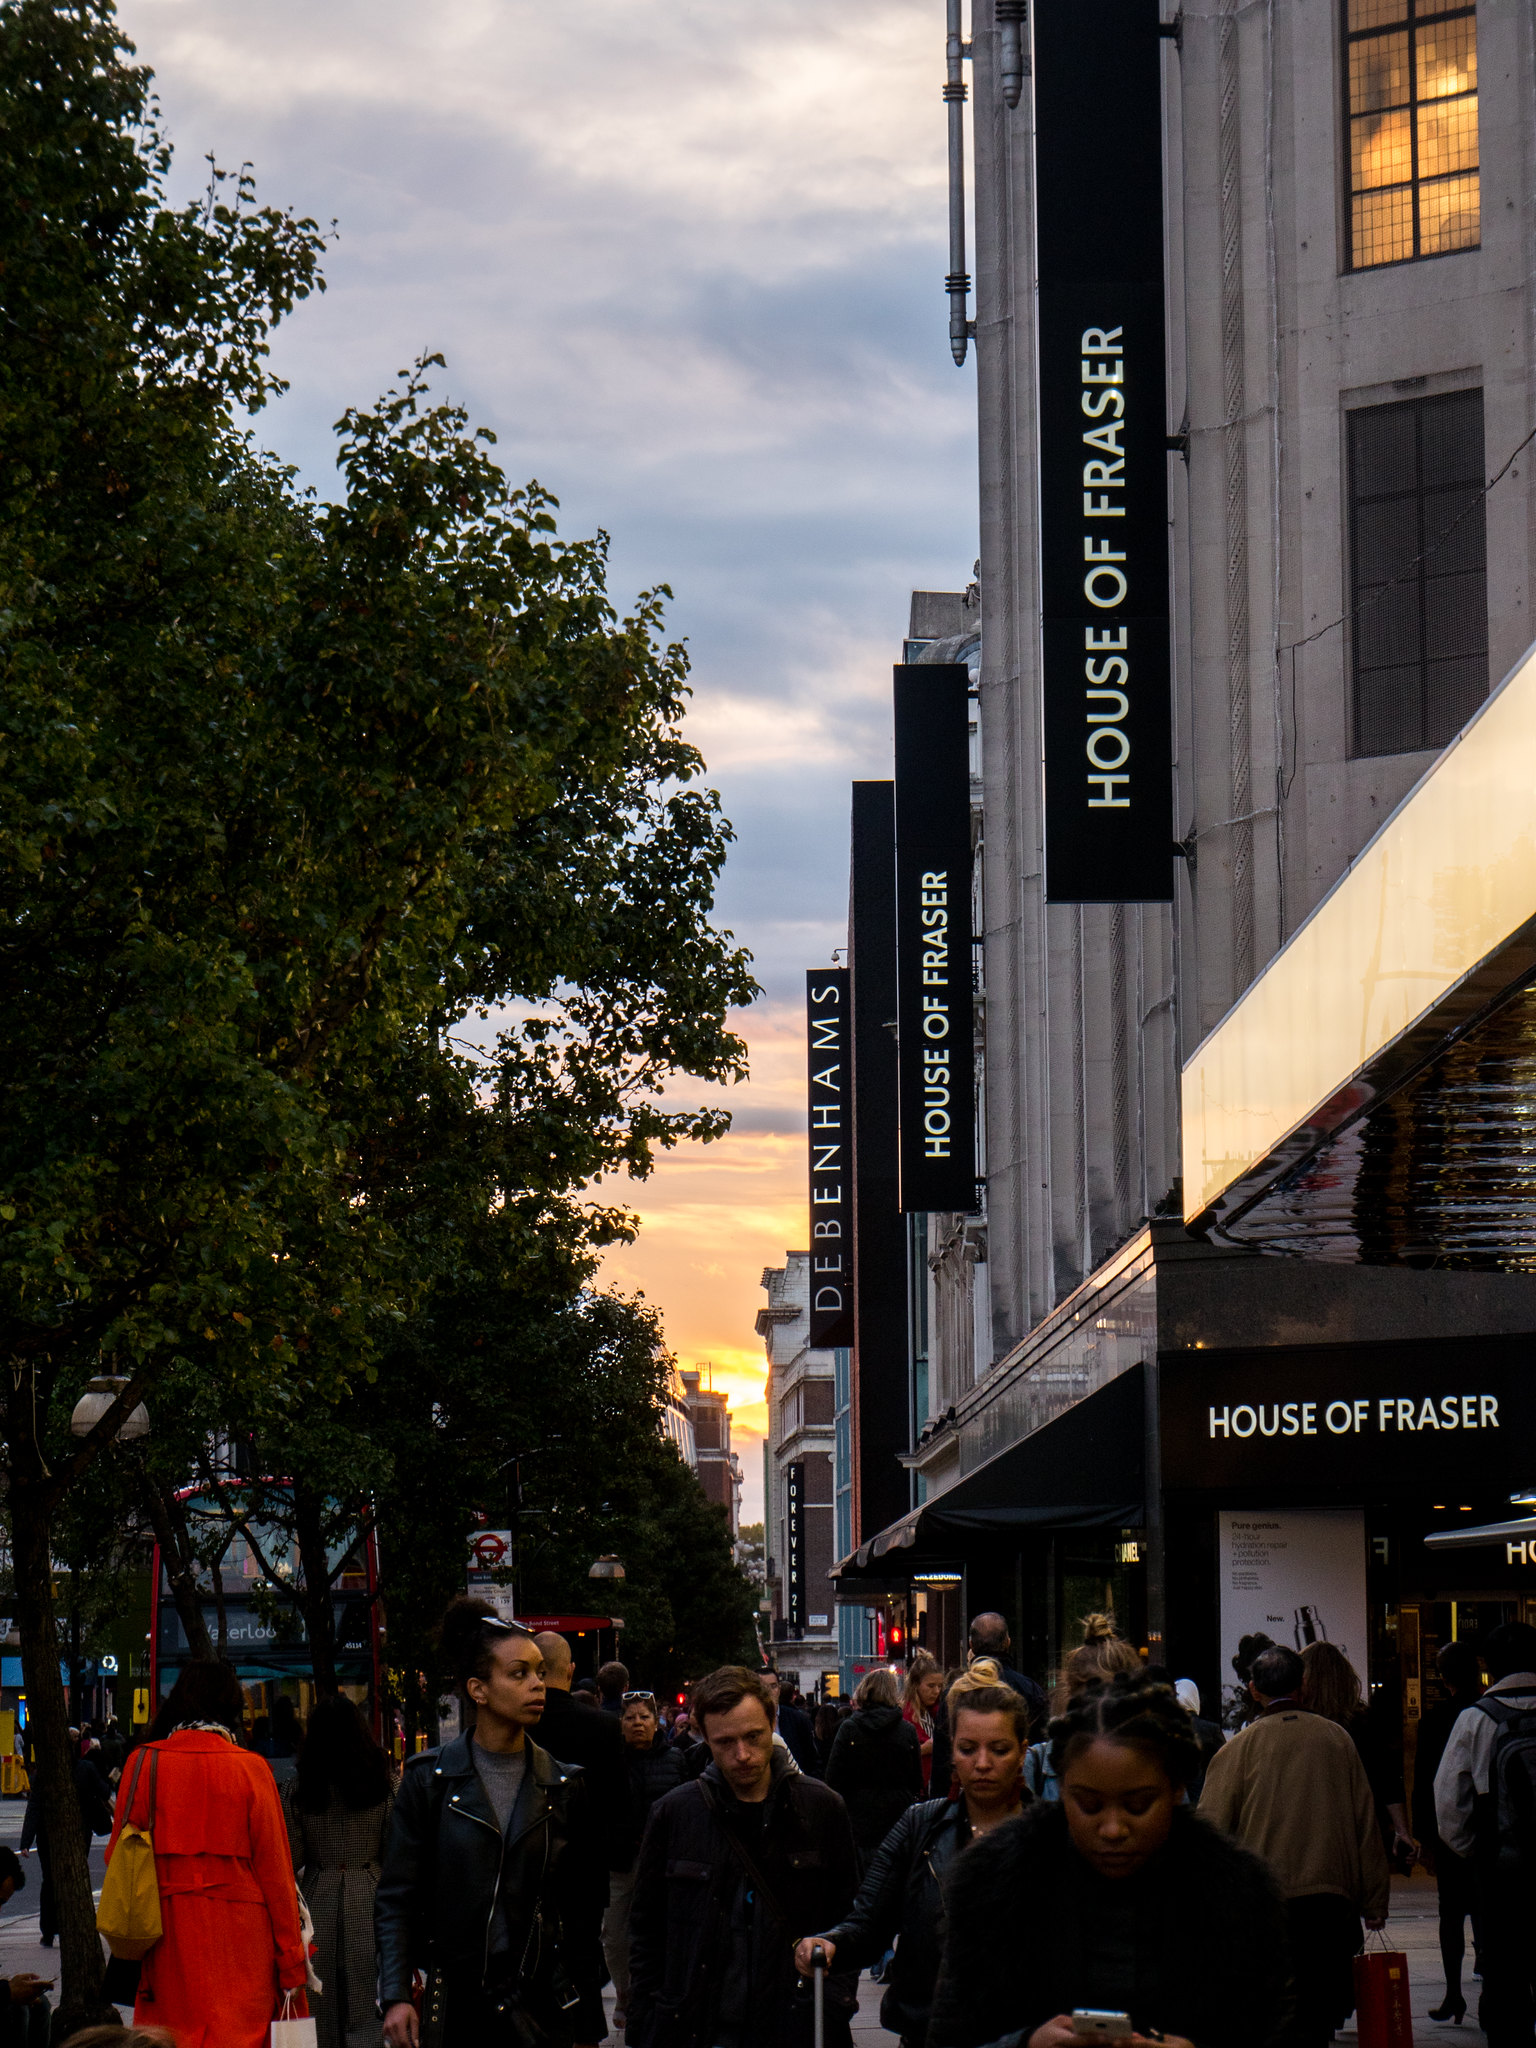 lontoo oxford street (8 of 10)